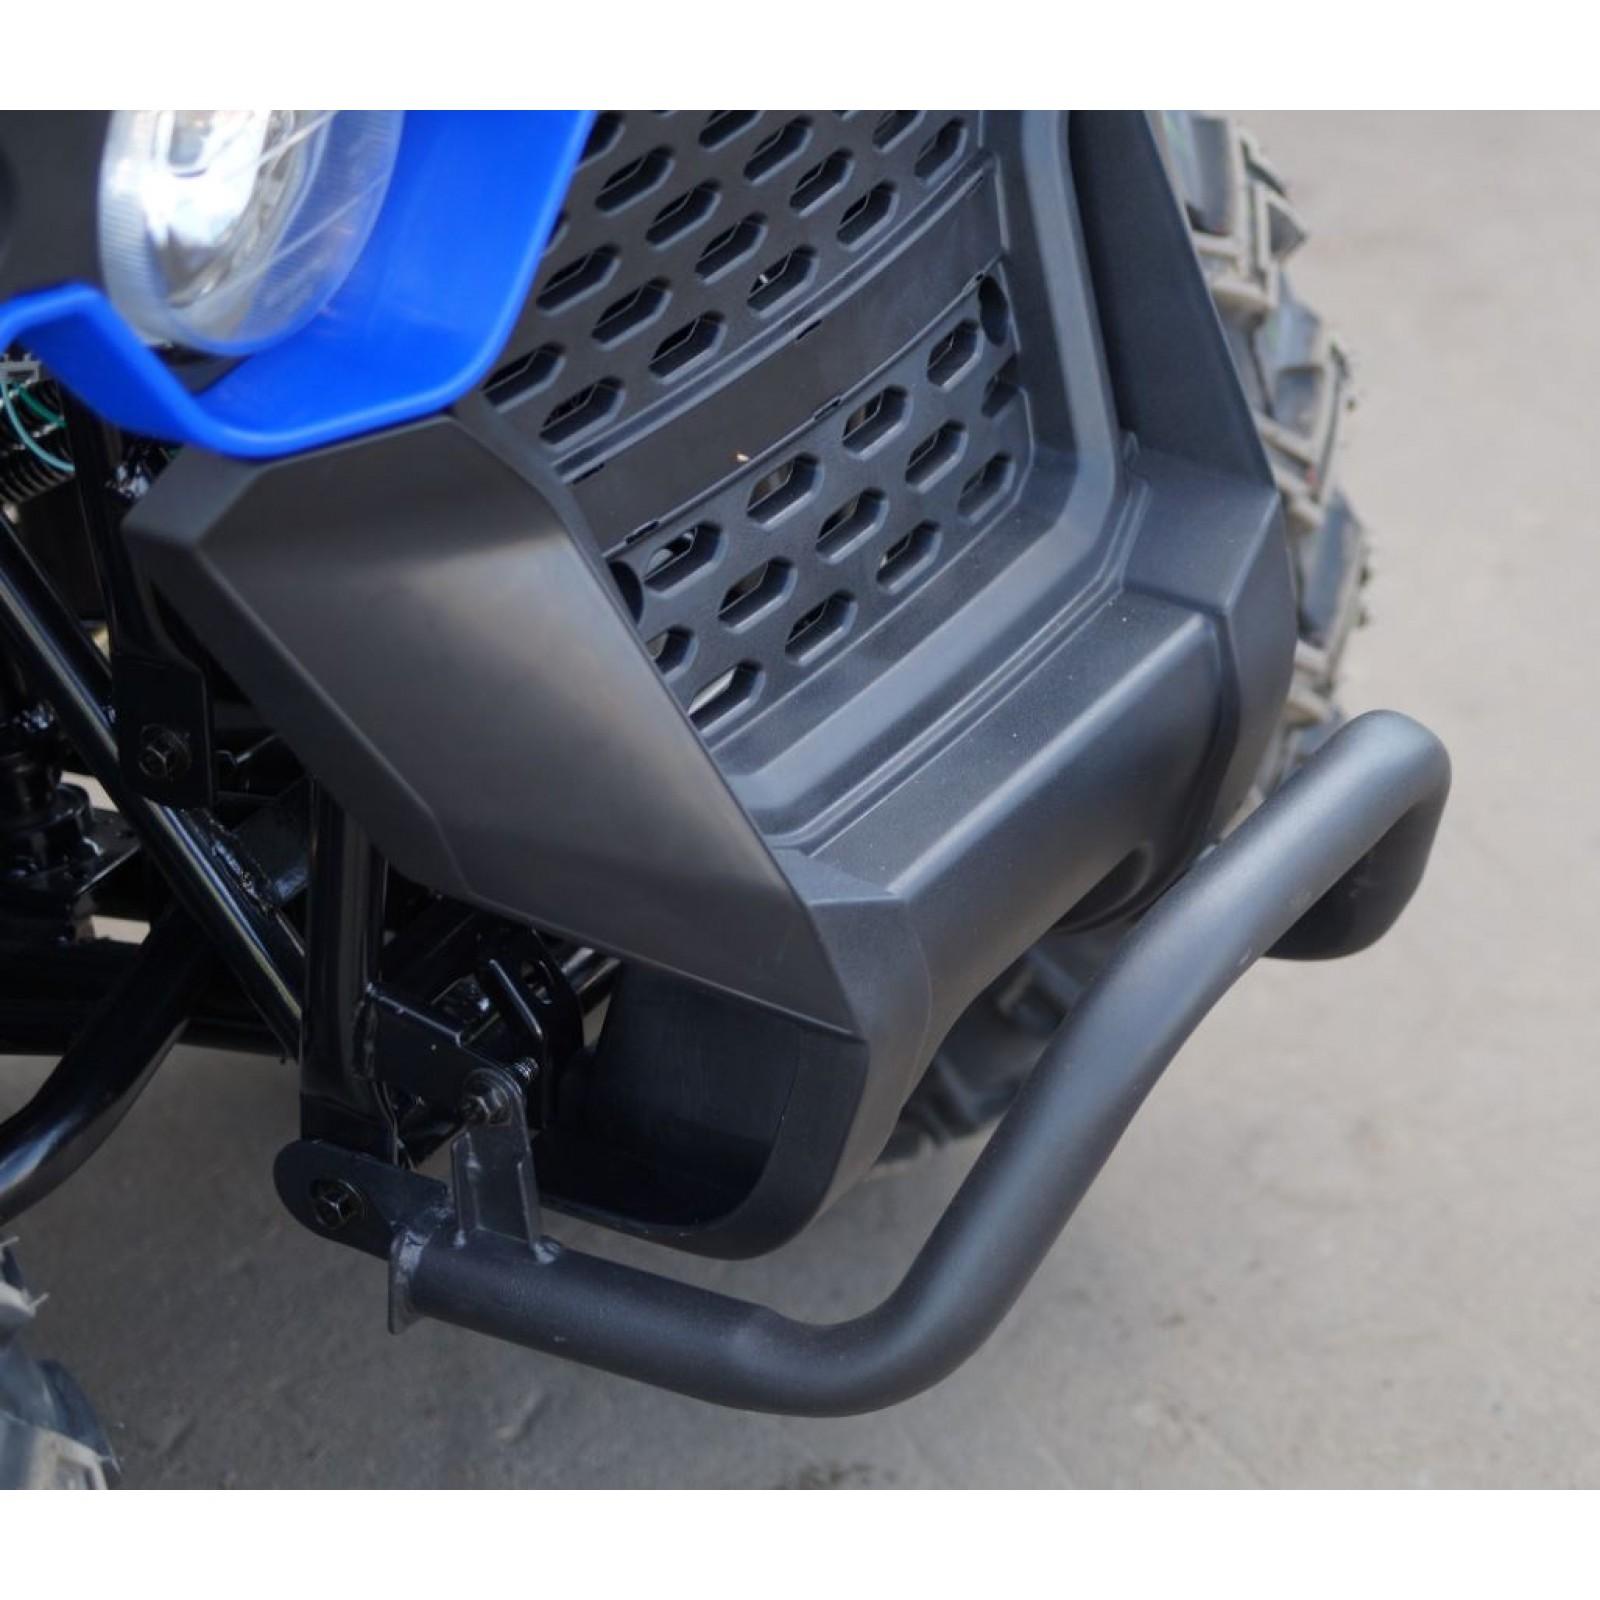 Квадроцикл Linhai Yamaha M200 2020 года